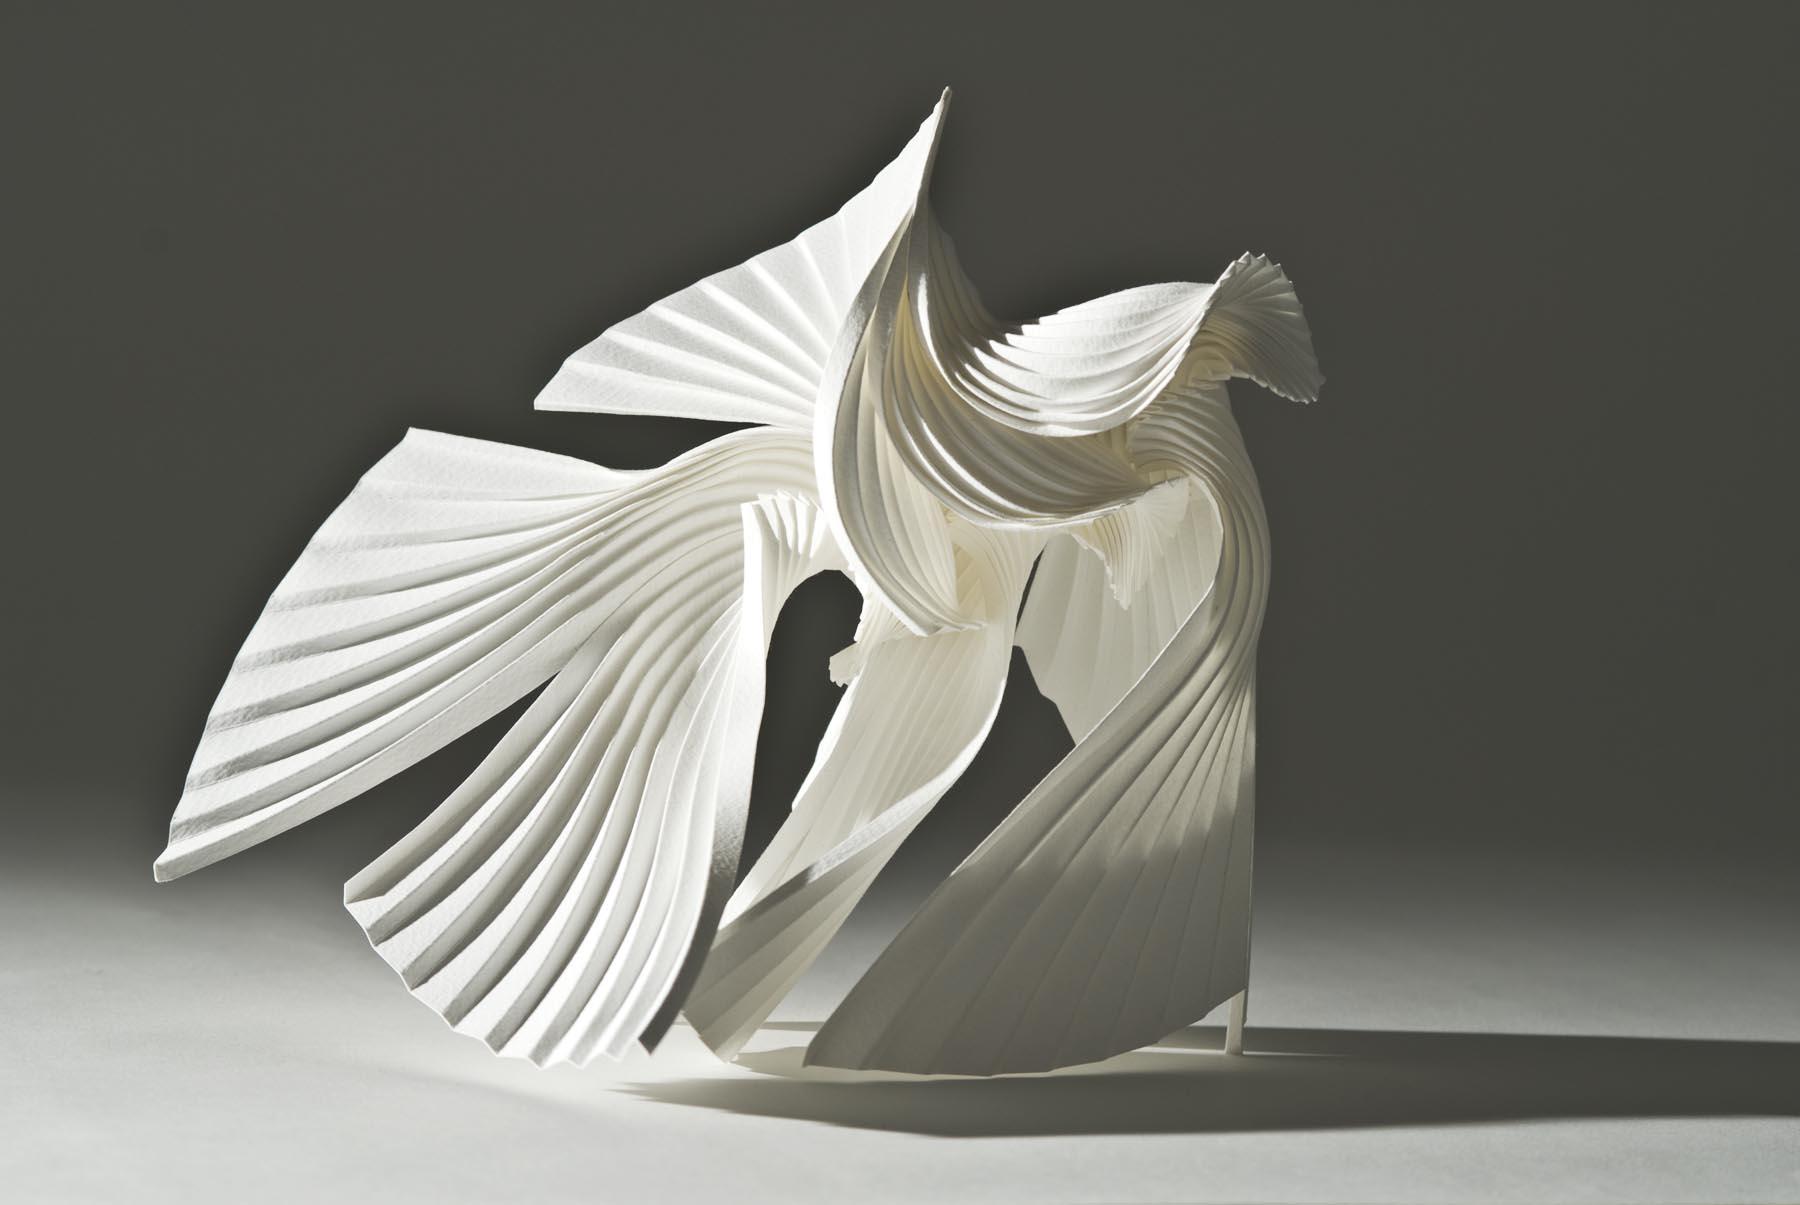 paper sculptures Hello@papersculptureeu | +48 509 053 420 designed by: parastudio developed by: owls departmentparastudio developed by: owls department.